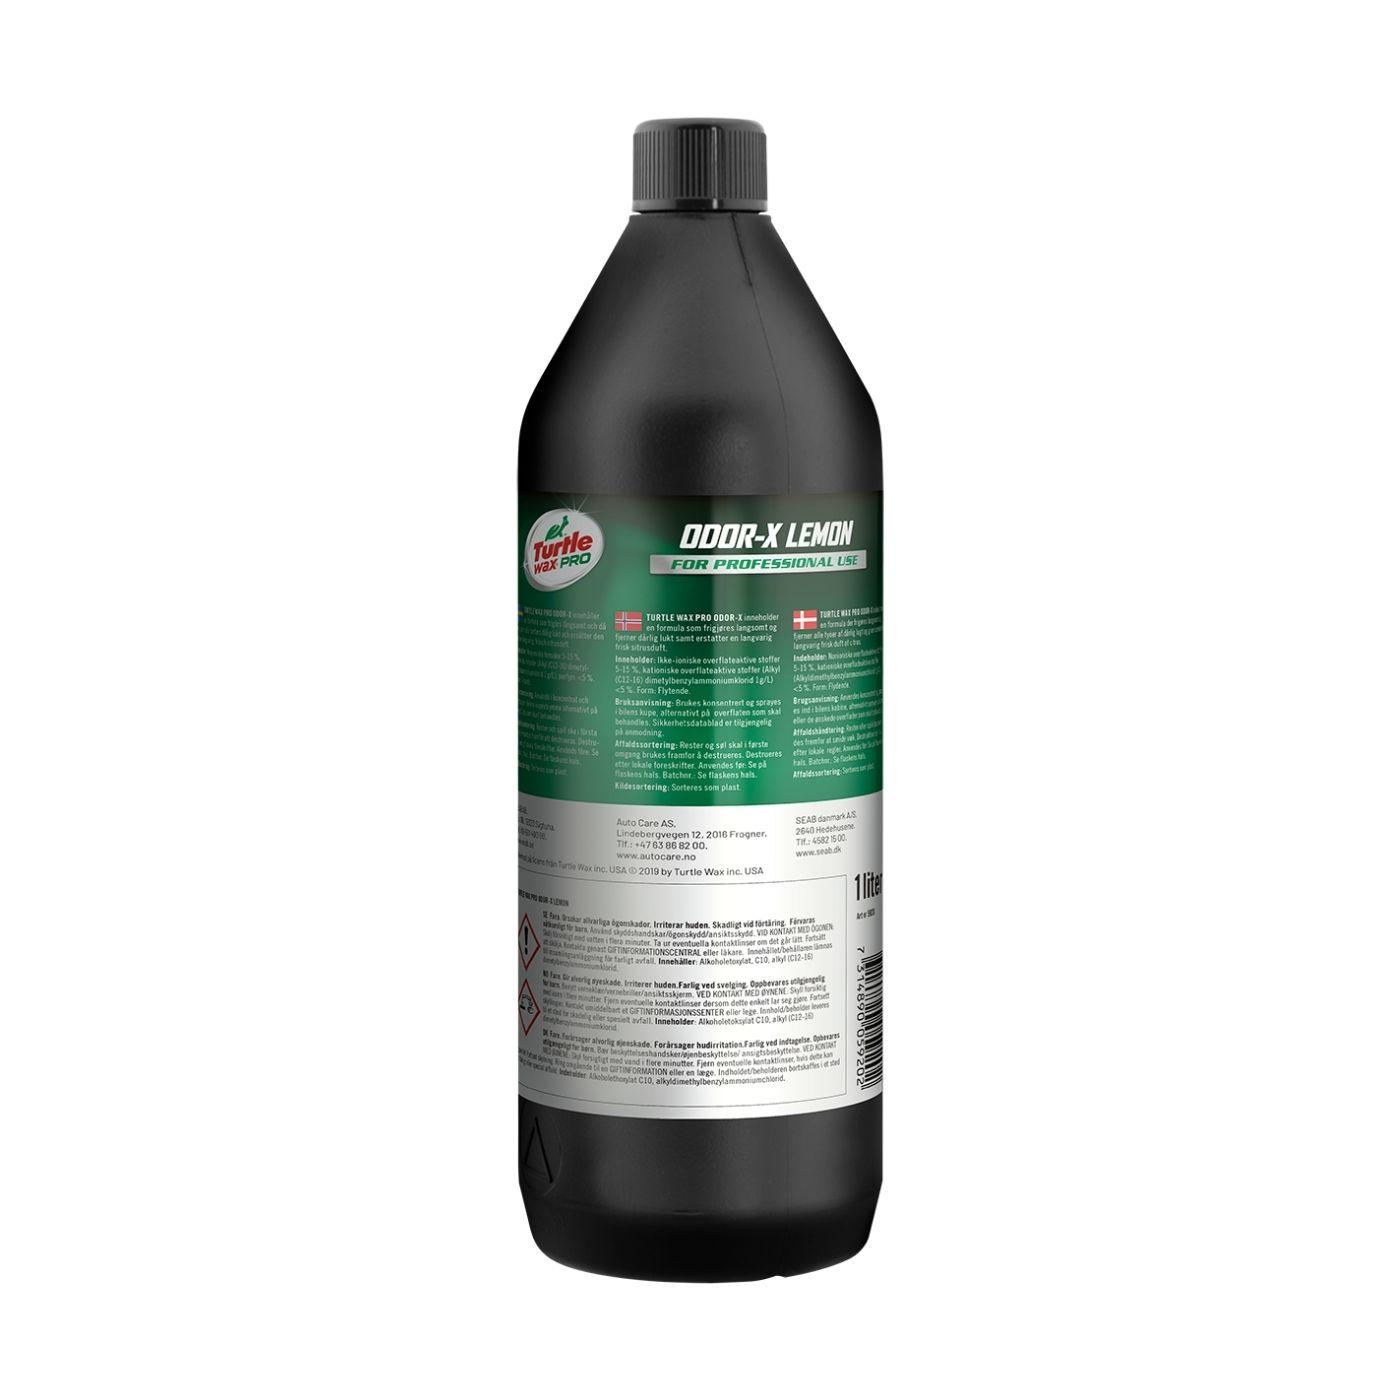 Luktborttagare Turtle Wax Pro Odor-X Lemon, 1000 ml